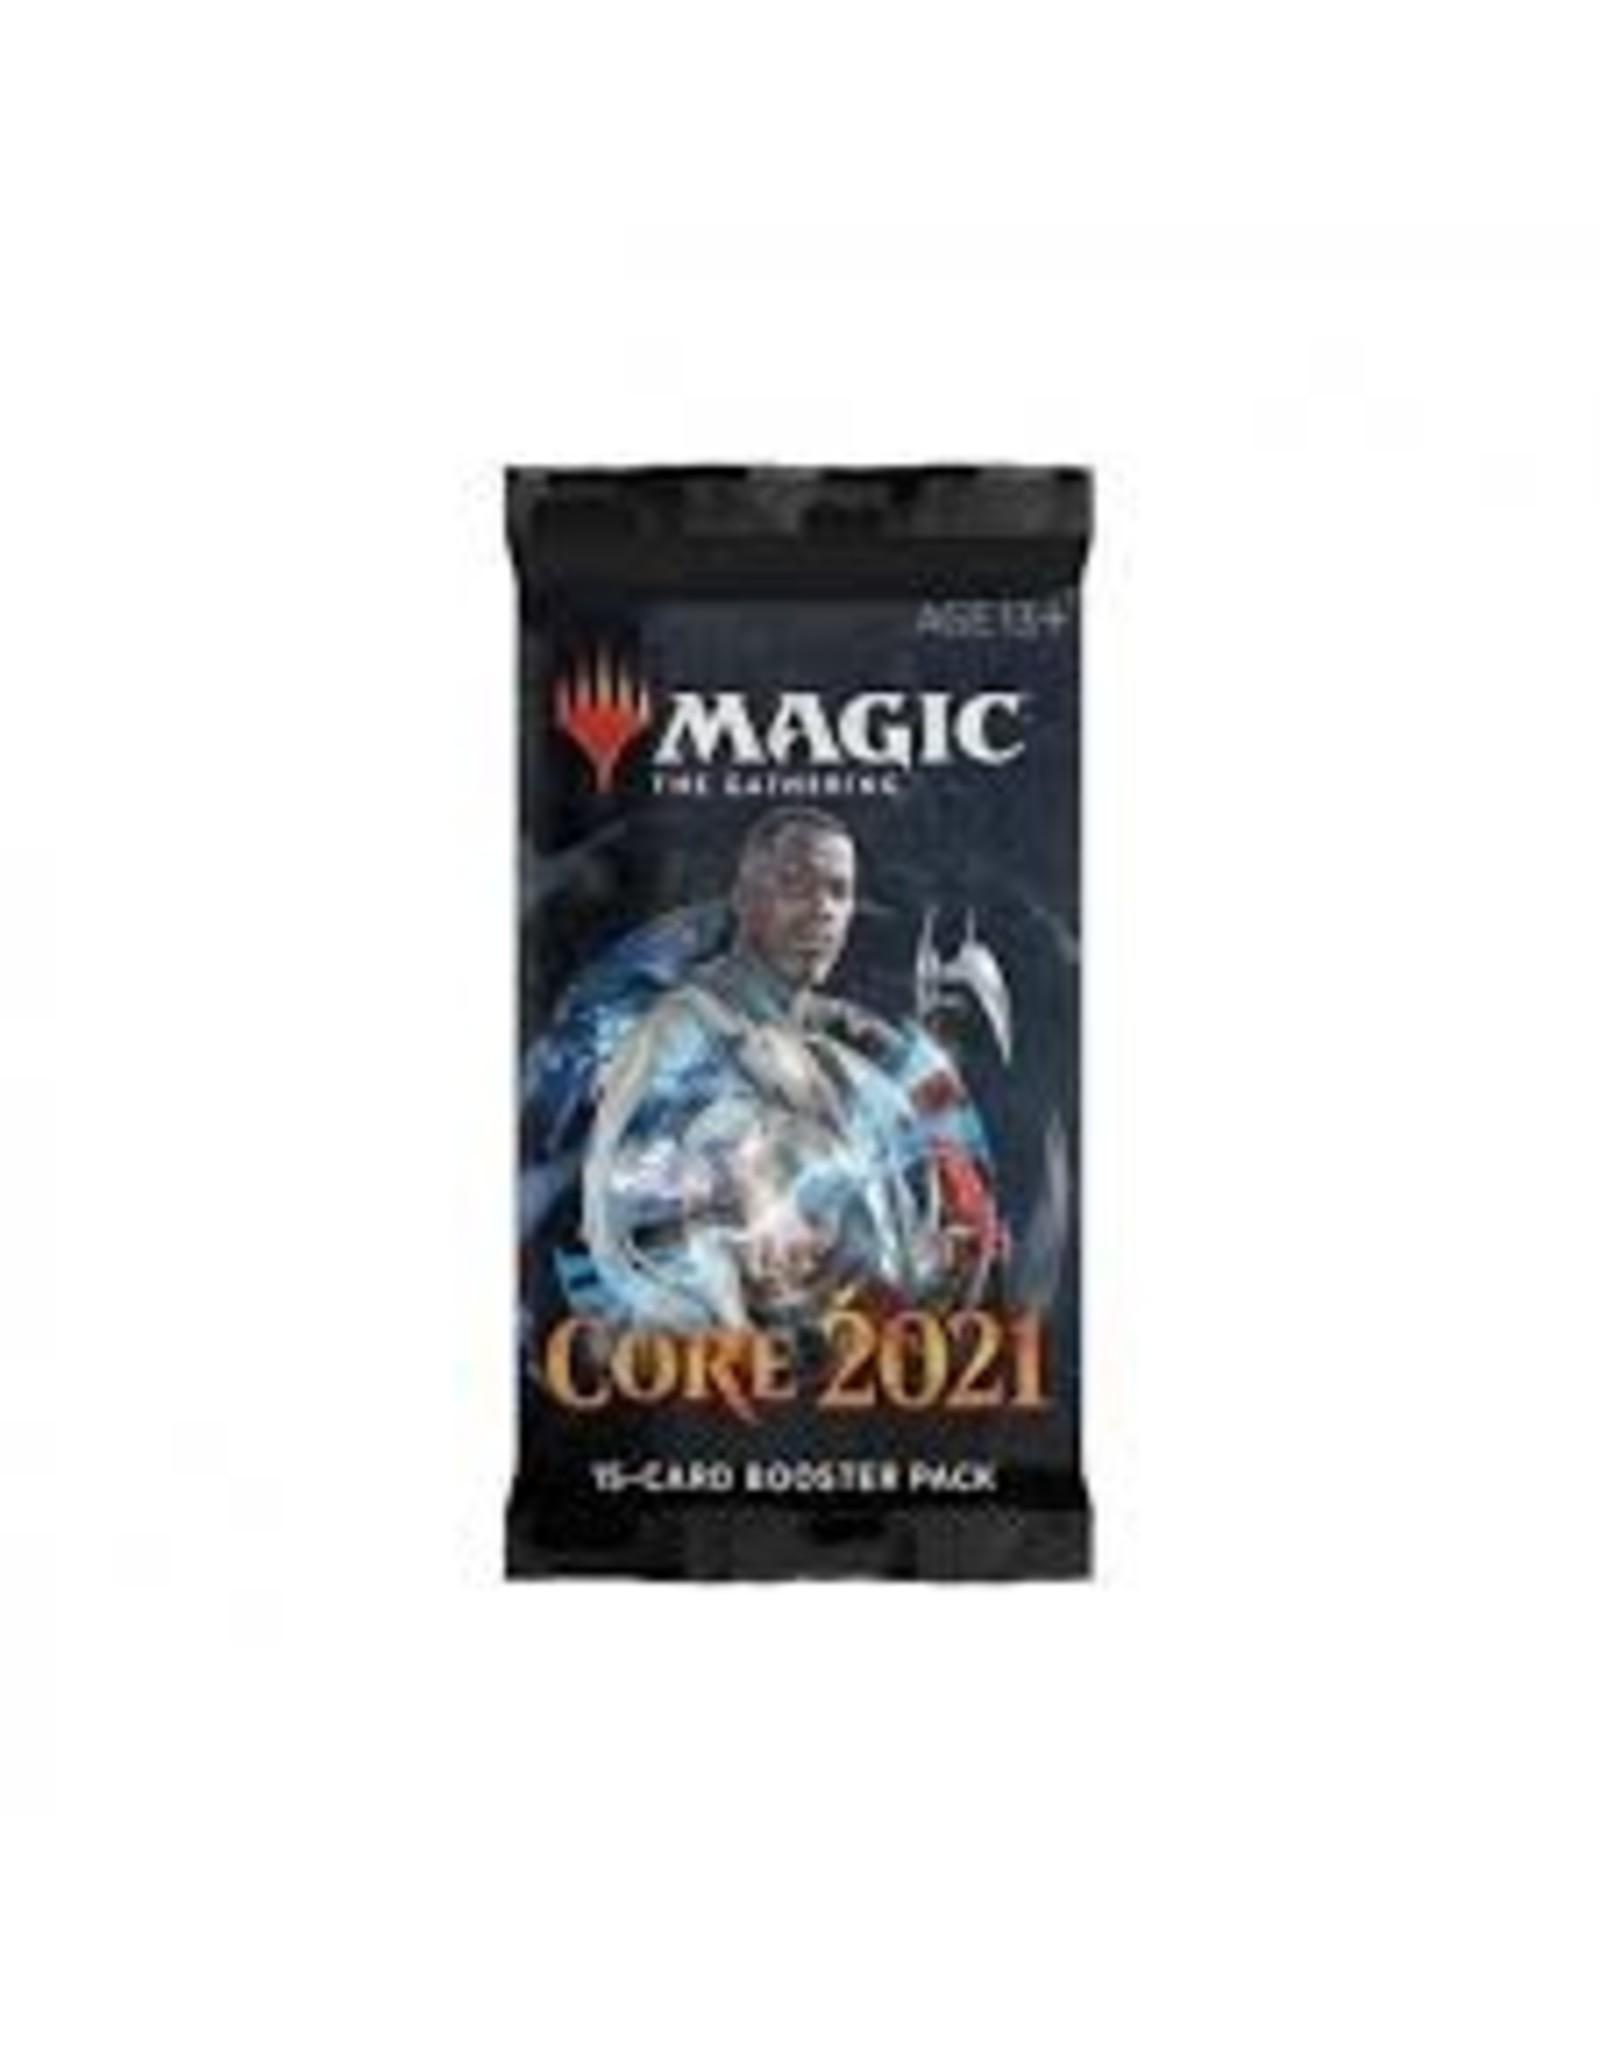 Magic MtG: Core 2021 Booster Pack